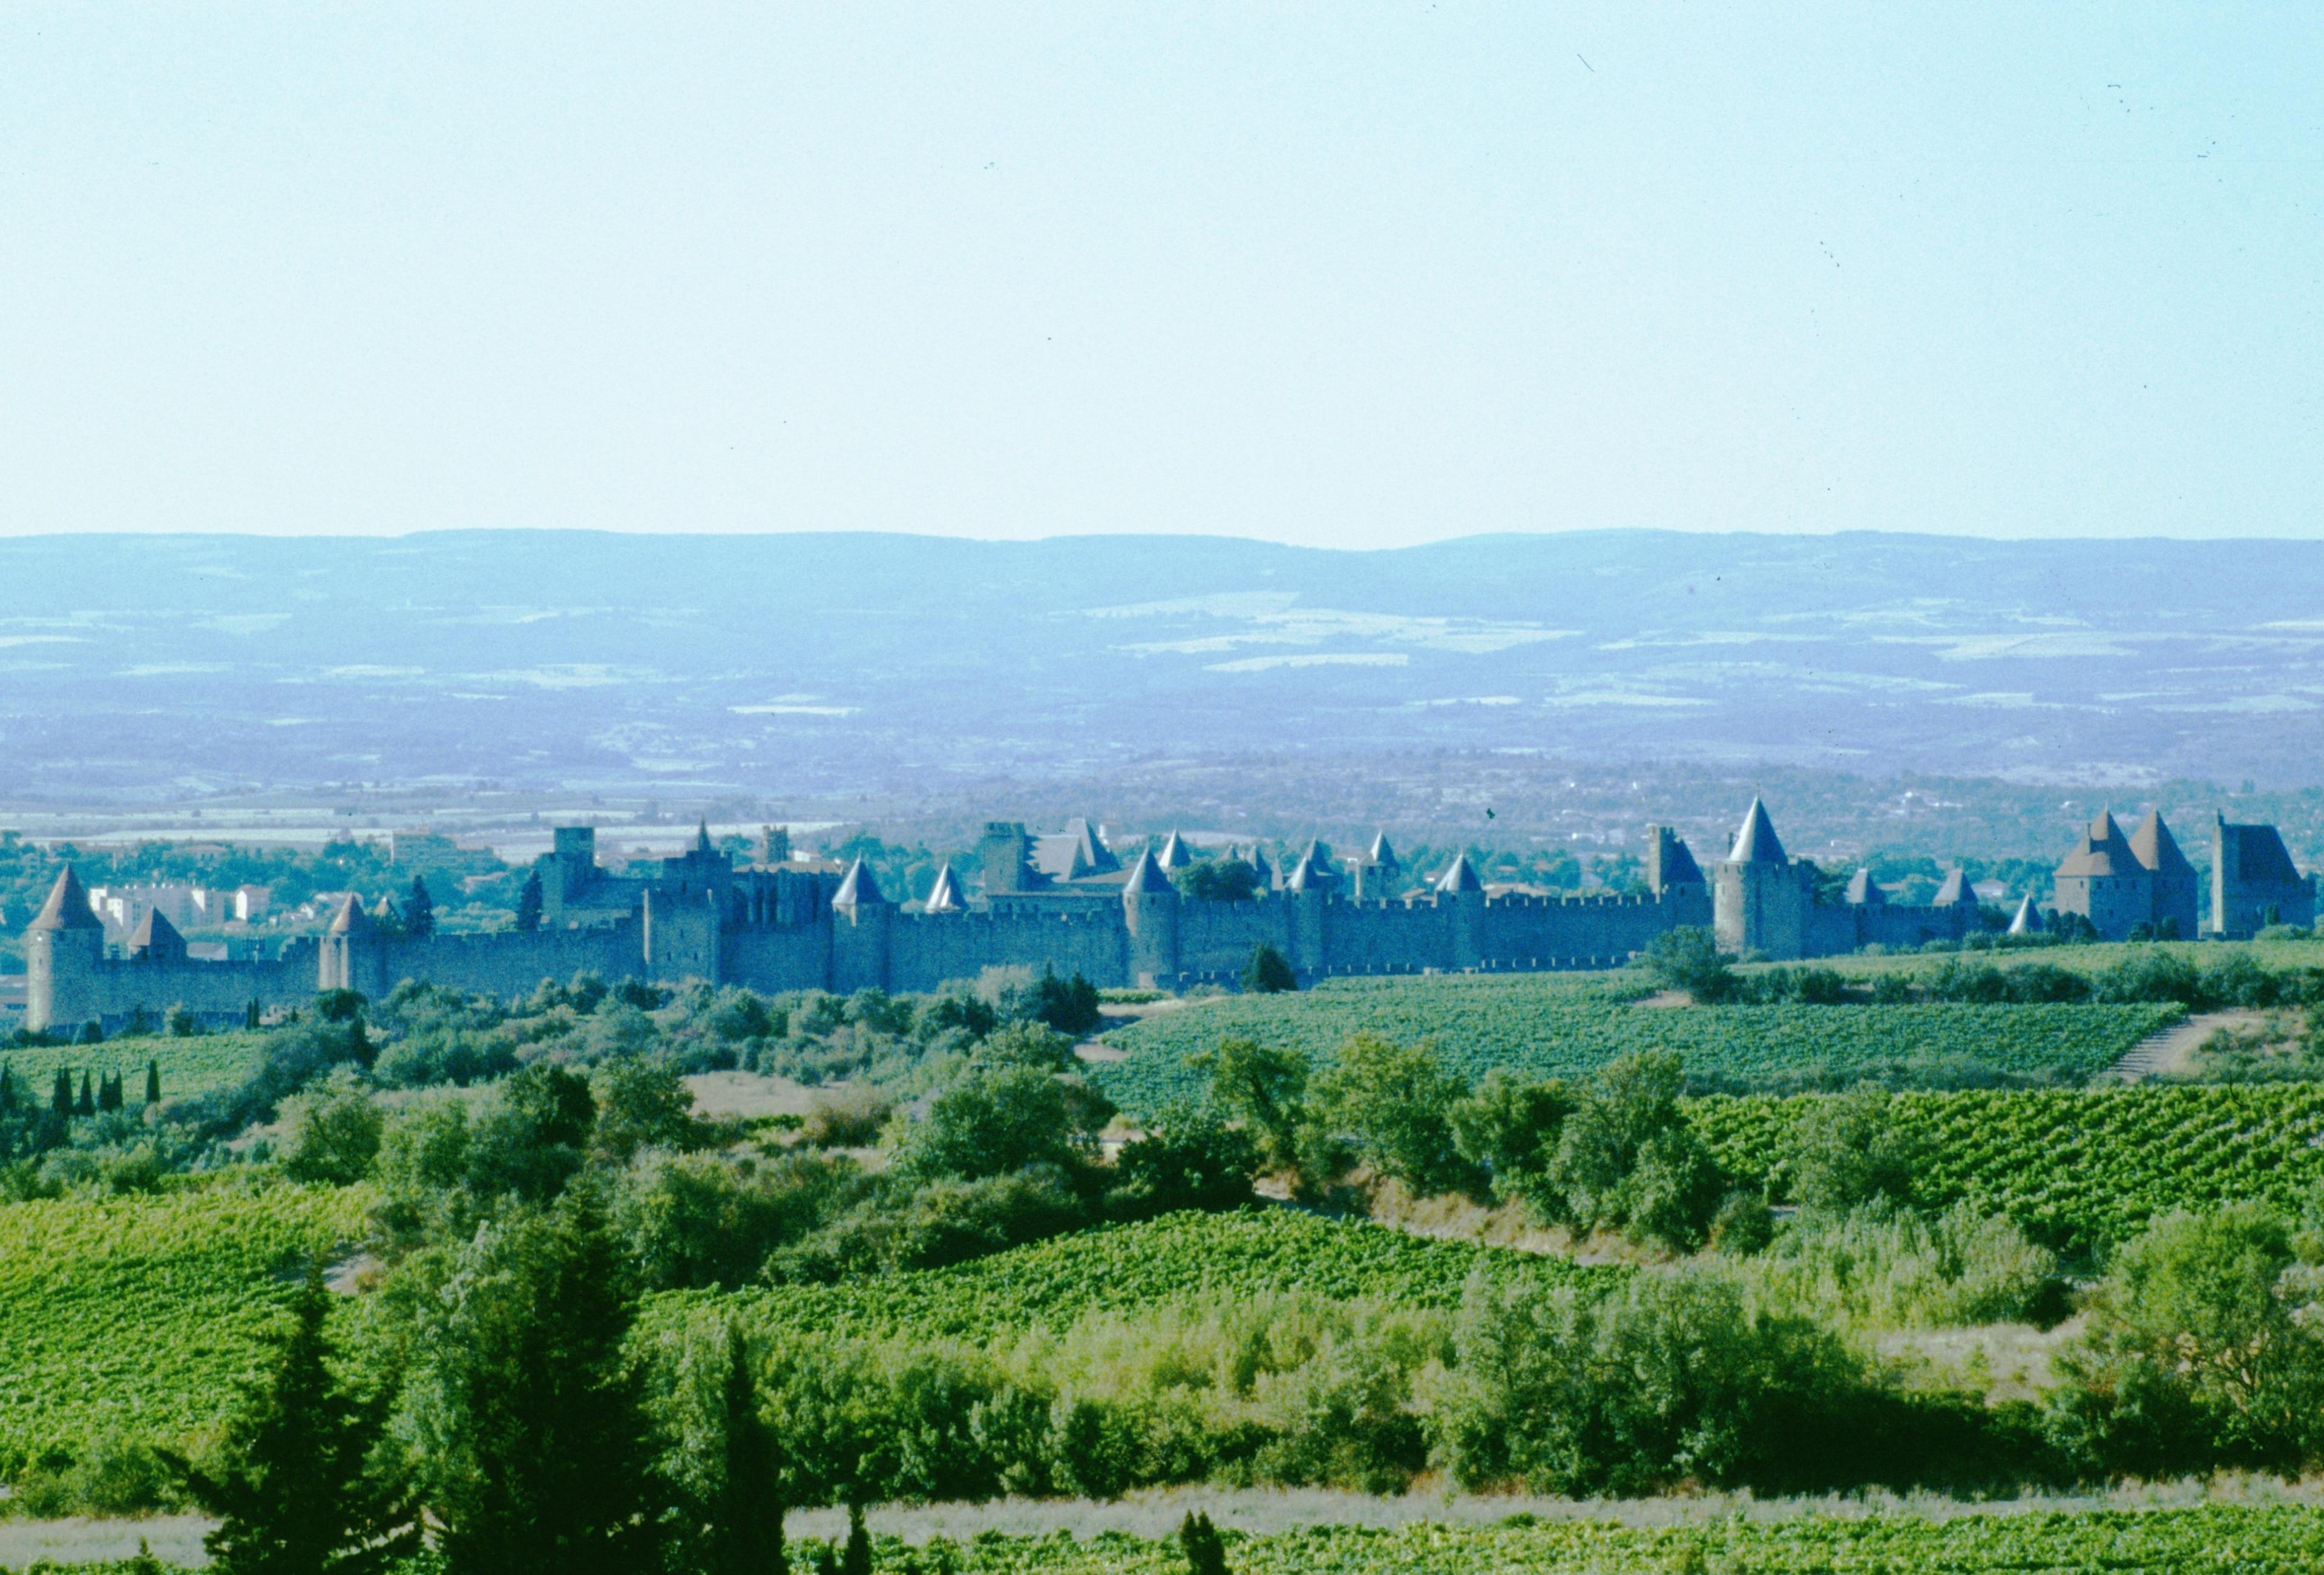 City of Carcassonne, Carcassonne, Aude, France